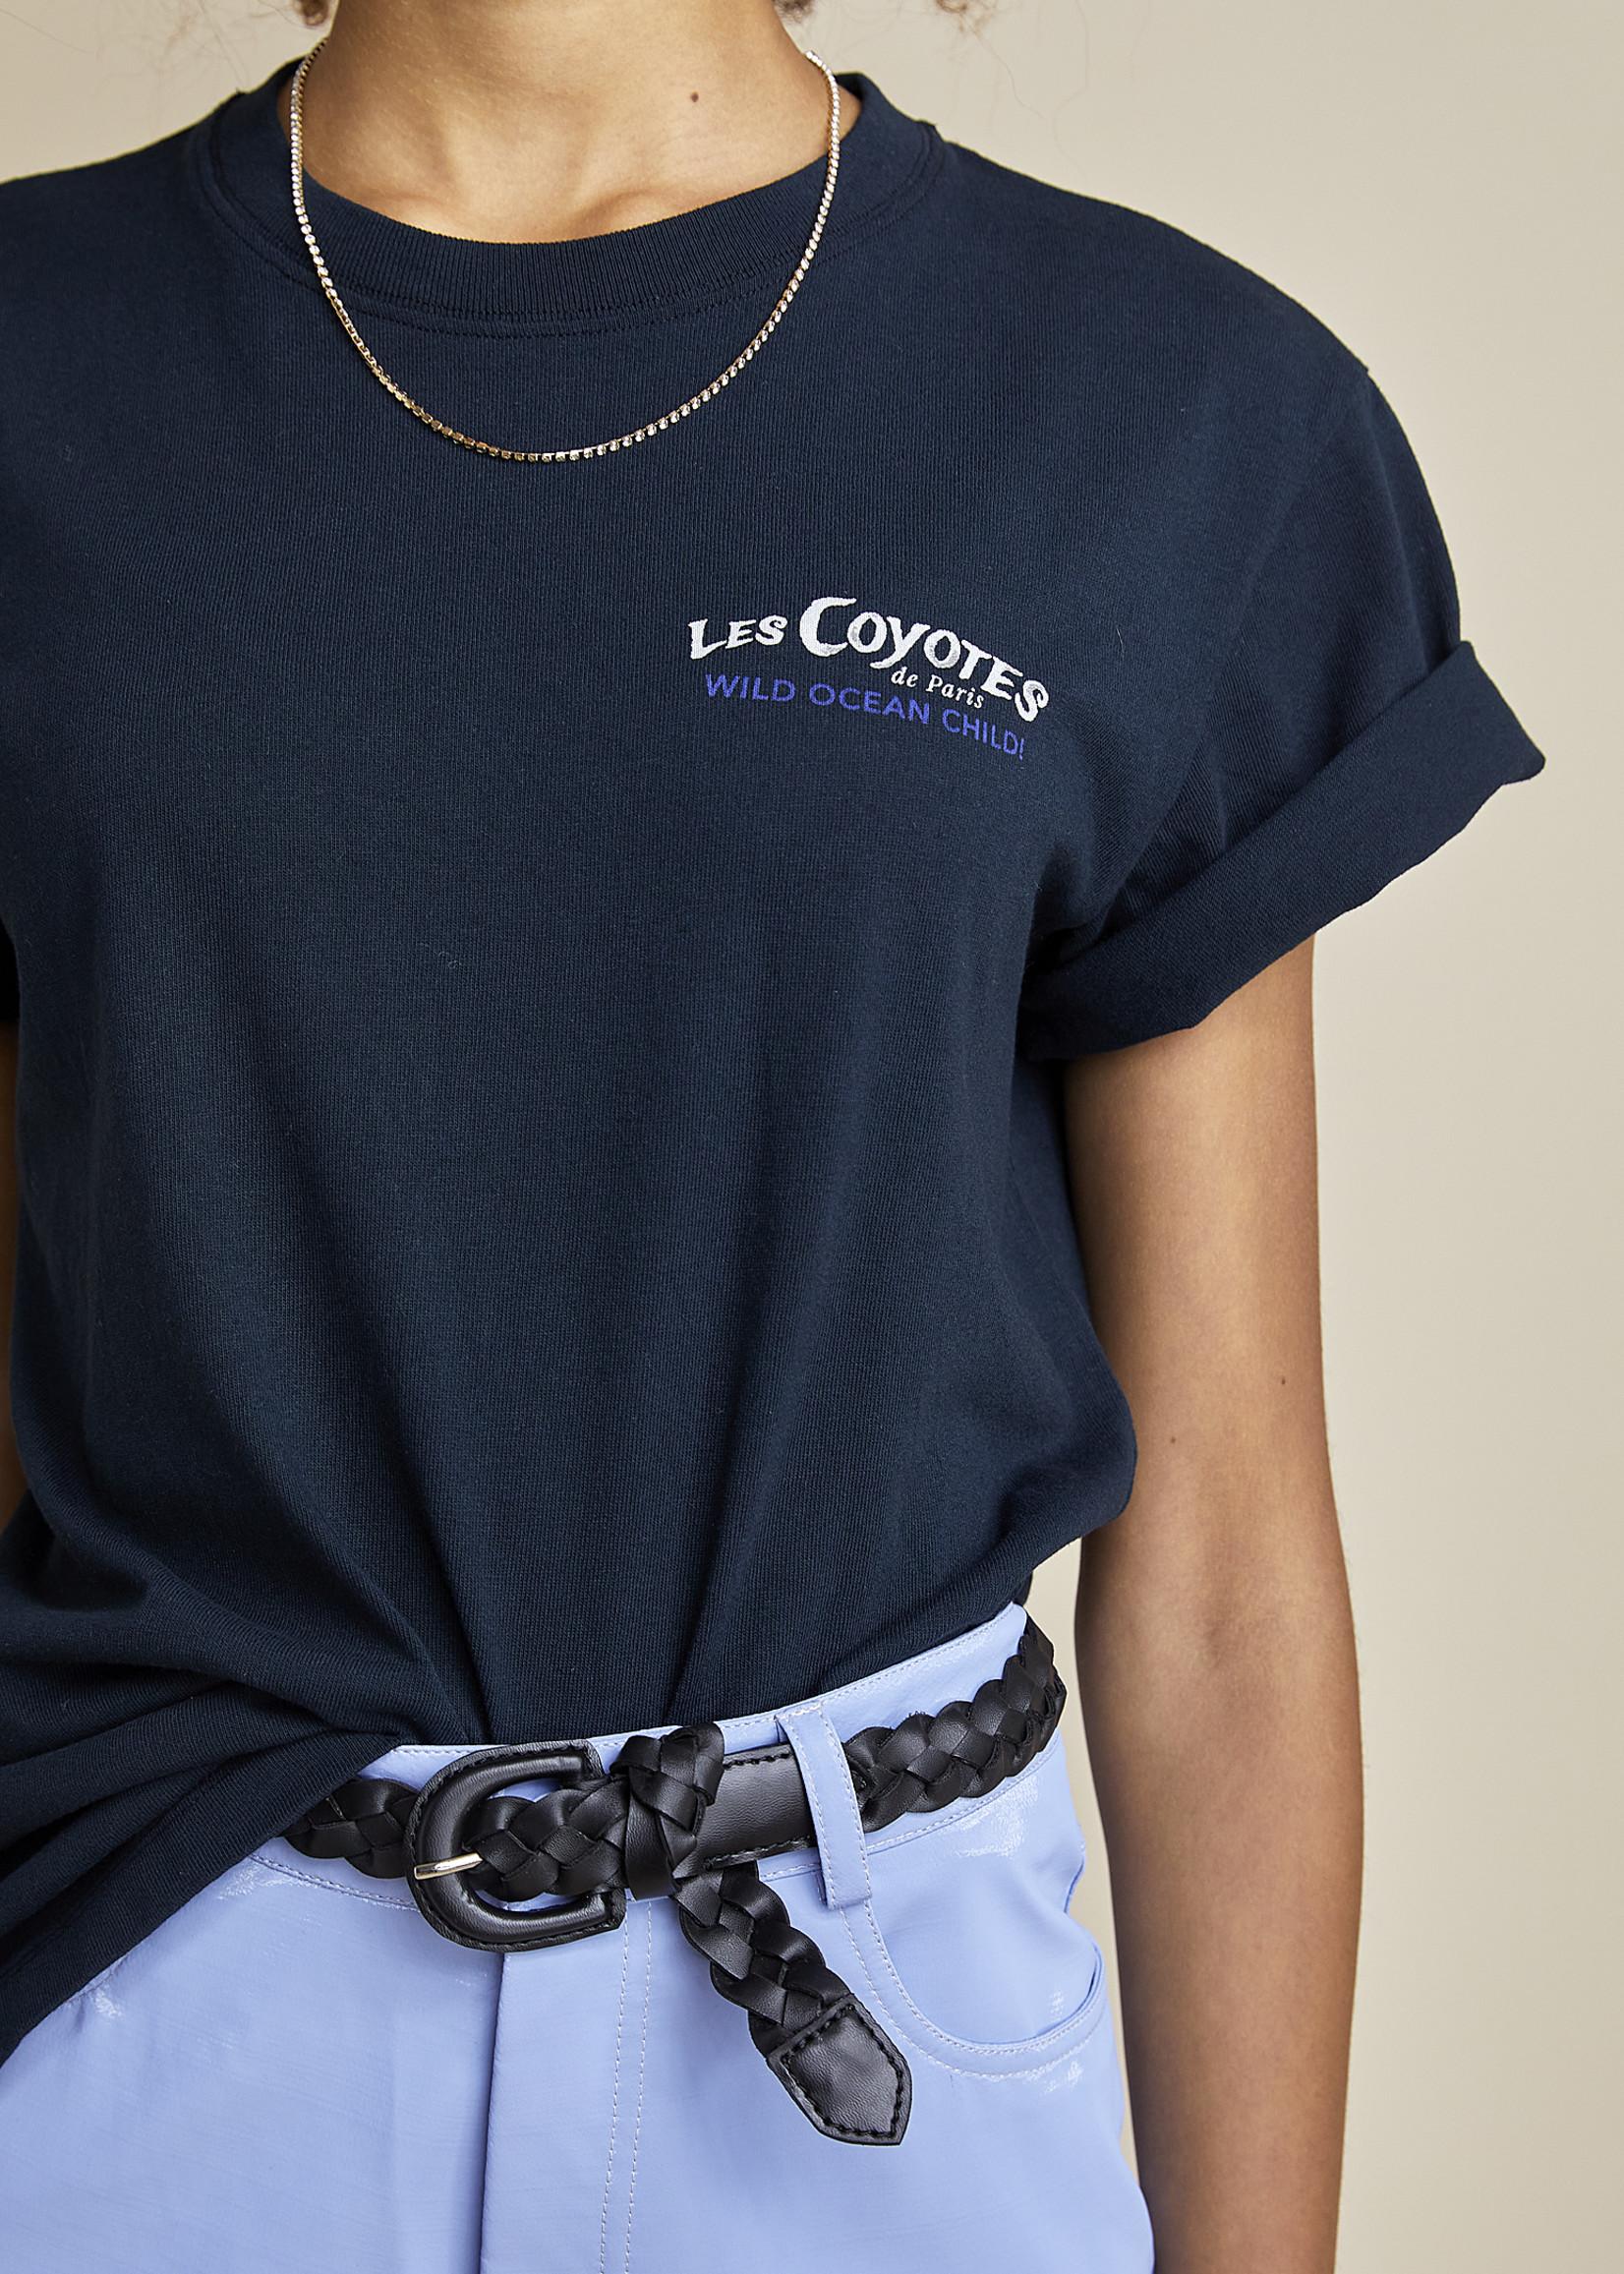 LES COYOTES DE PARIS T-SHIRT CINDY